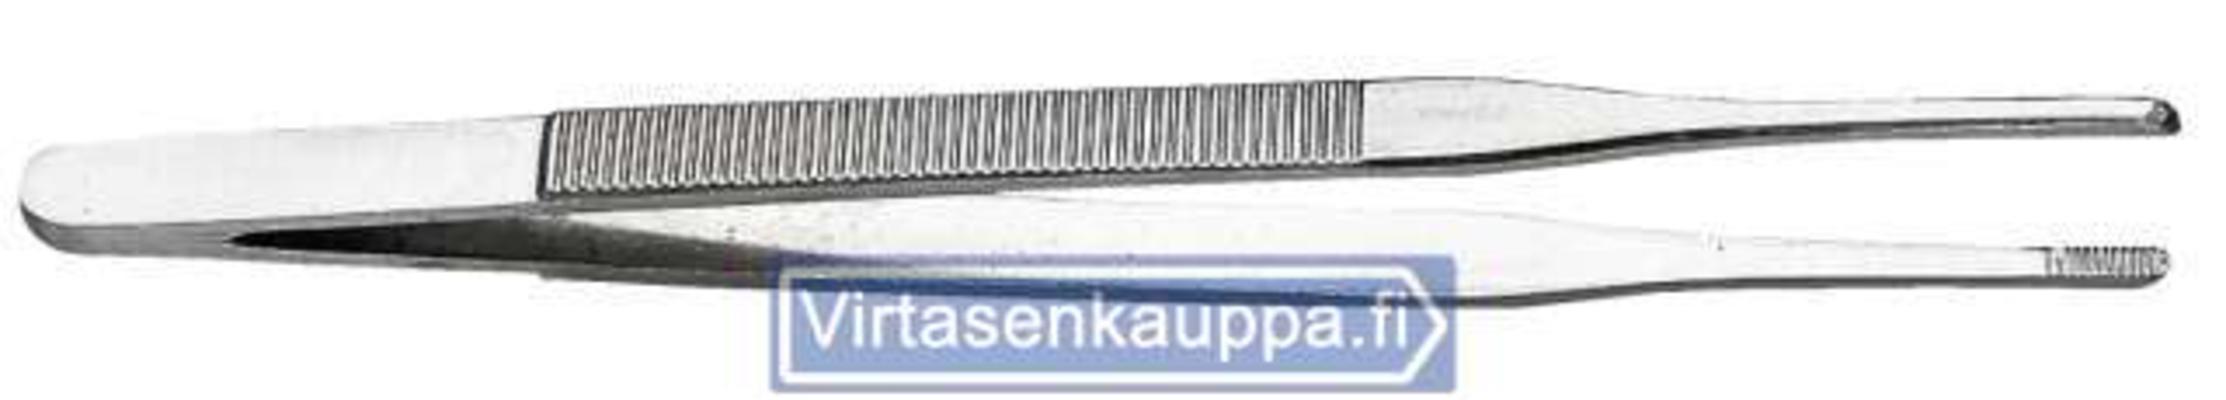 Pinsetit, Facom 154_PF01 - Pinsetit